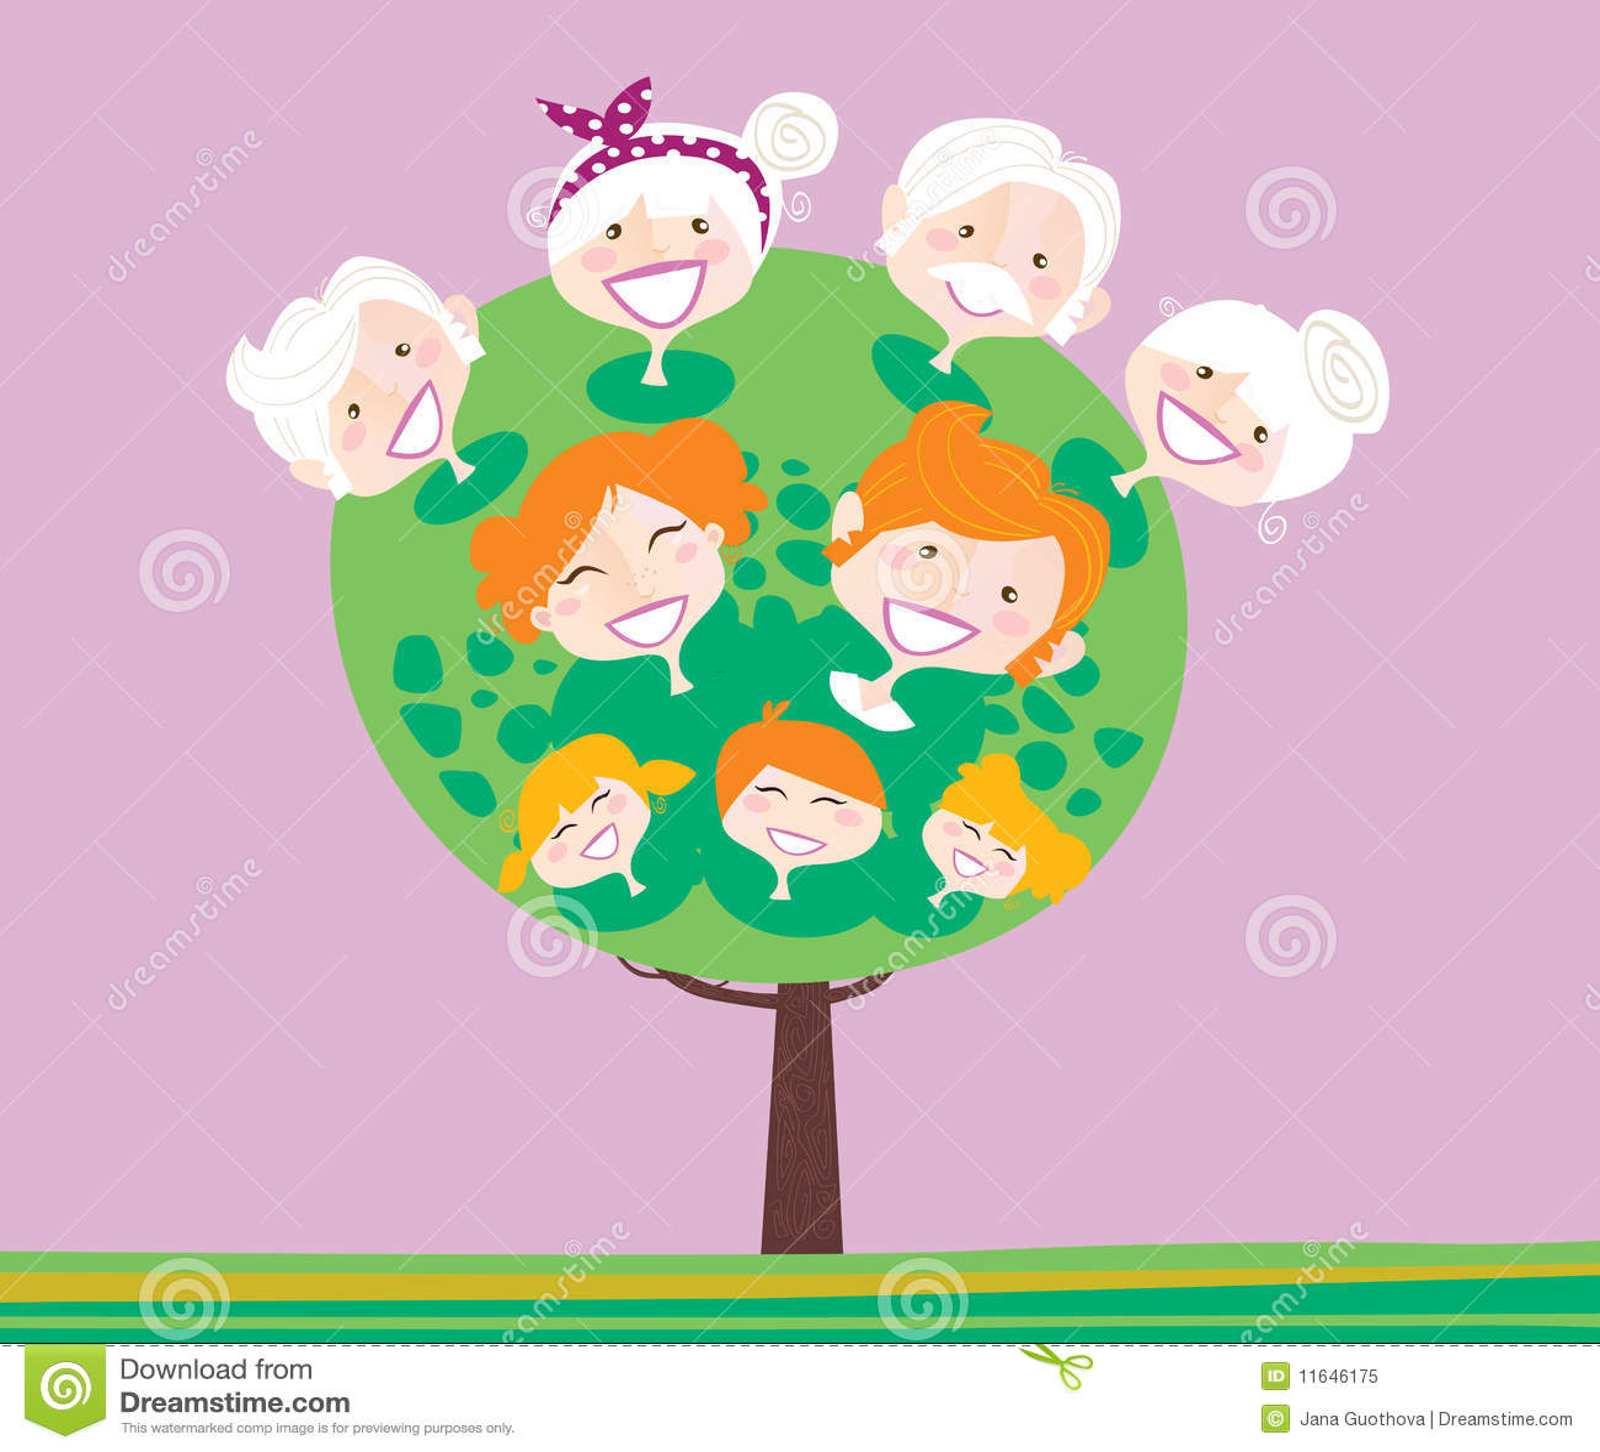 Triple generation family tree